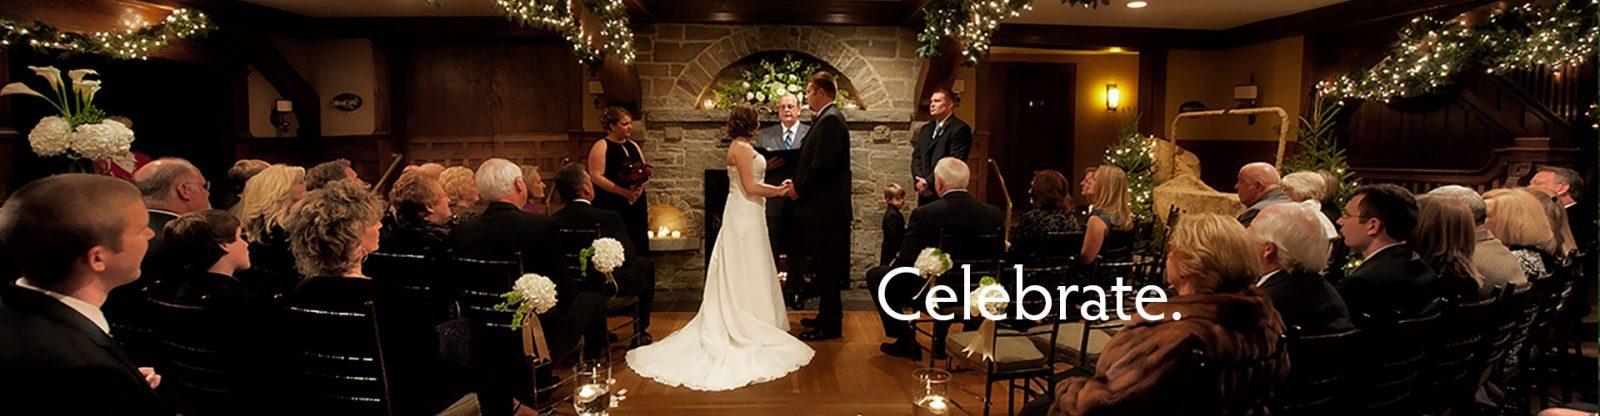 chetola weddings